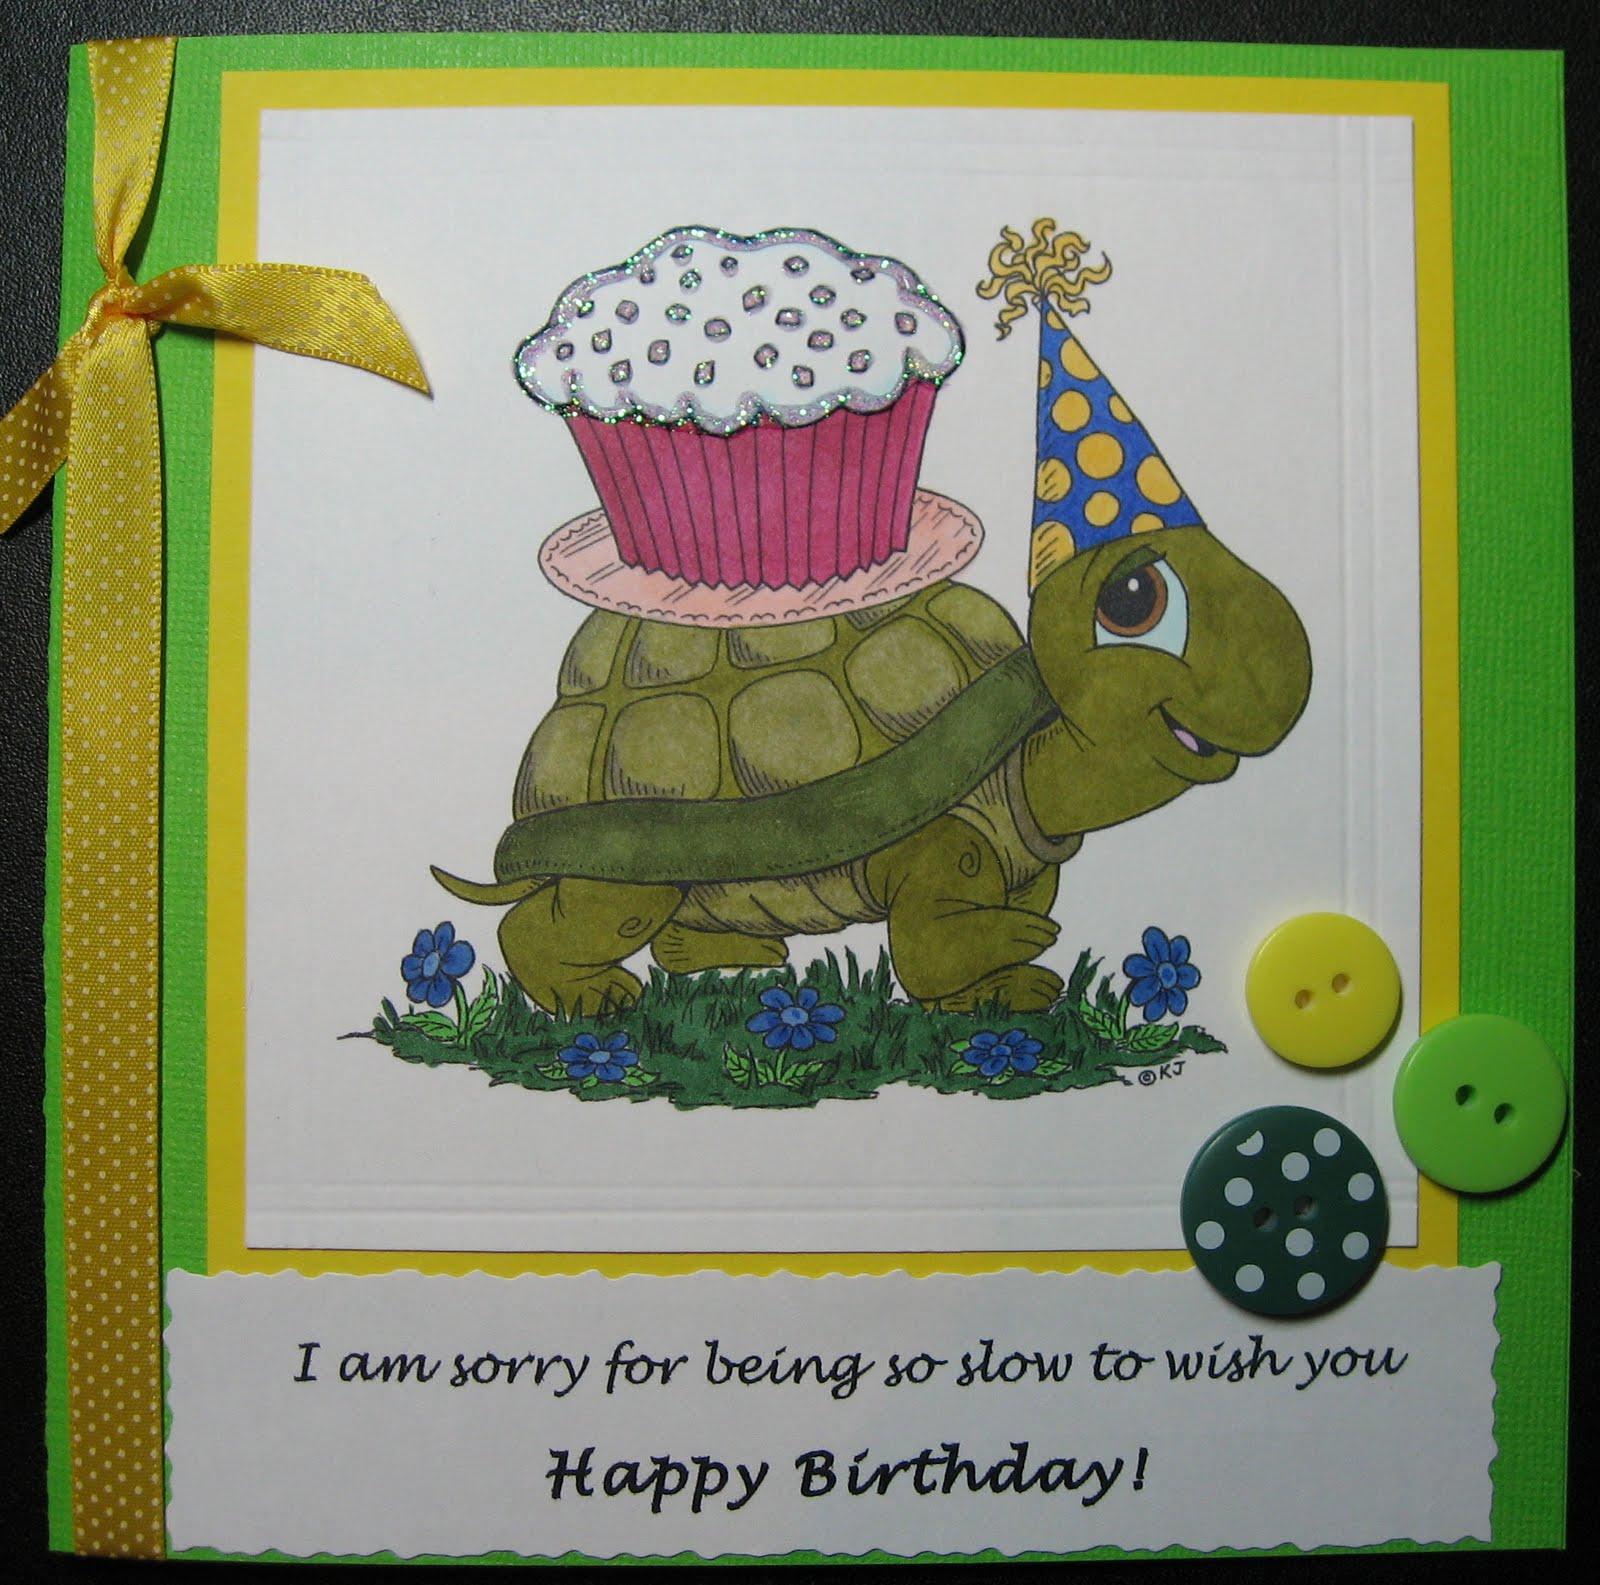 IDOCRAFTS: Slow Birthday Wishes